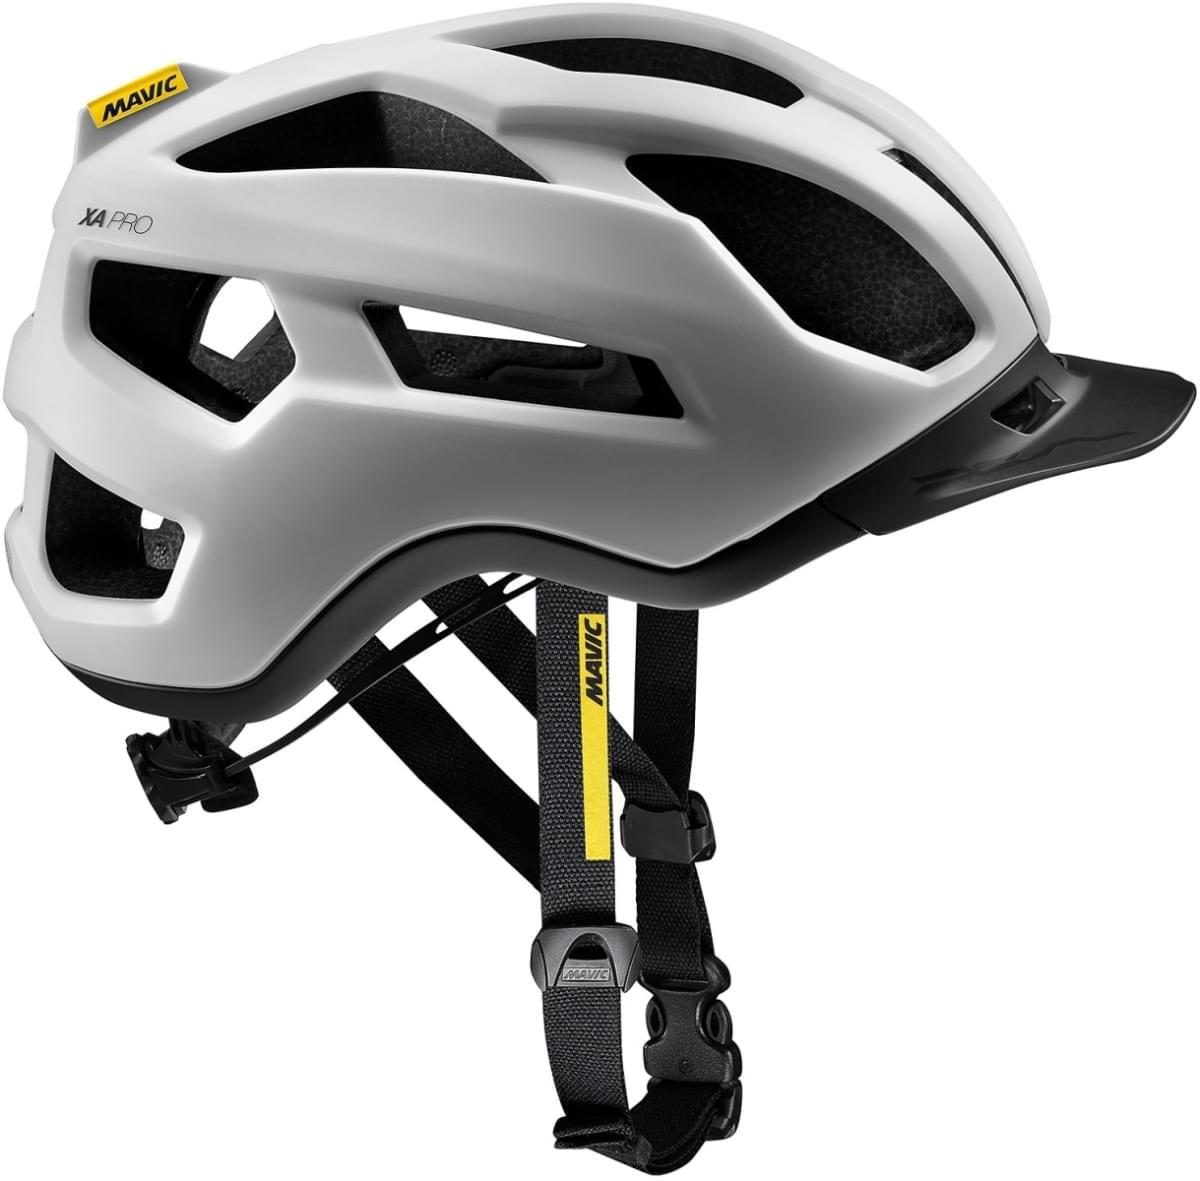 Mavic Xa Pro Helmet - white/black M